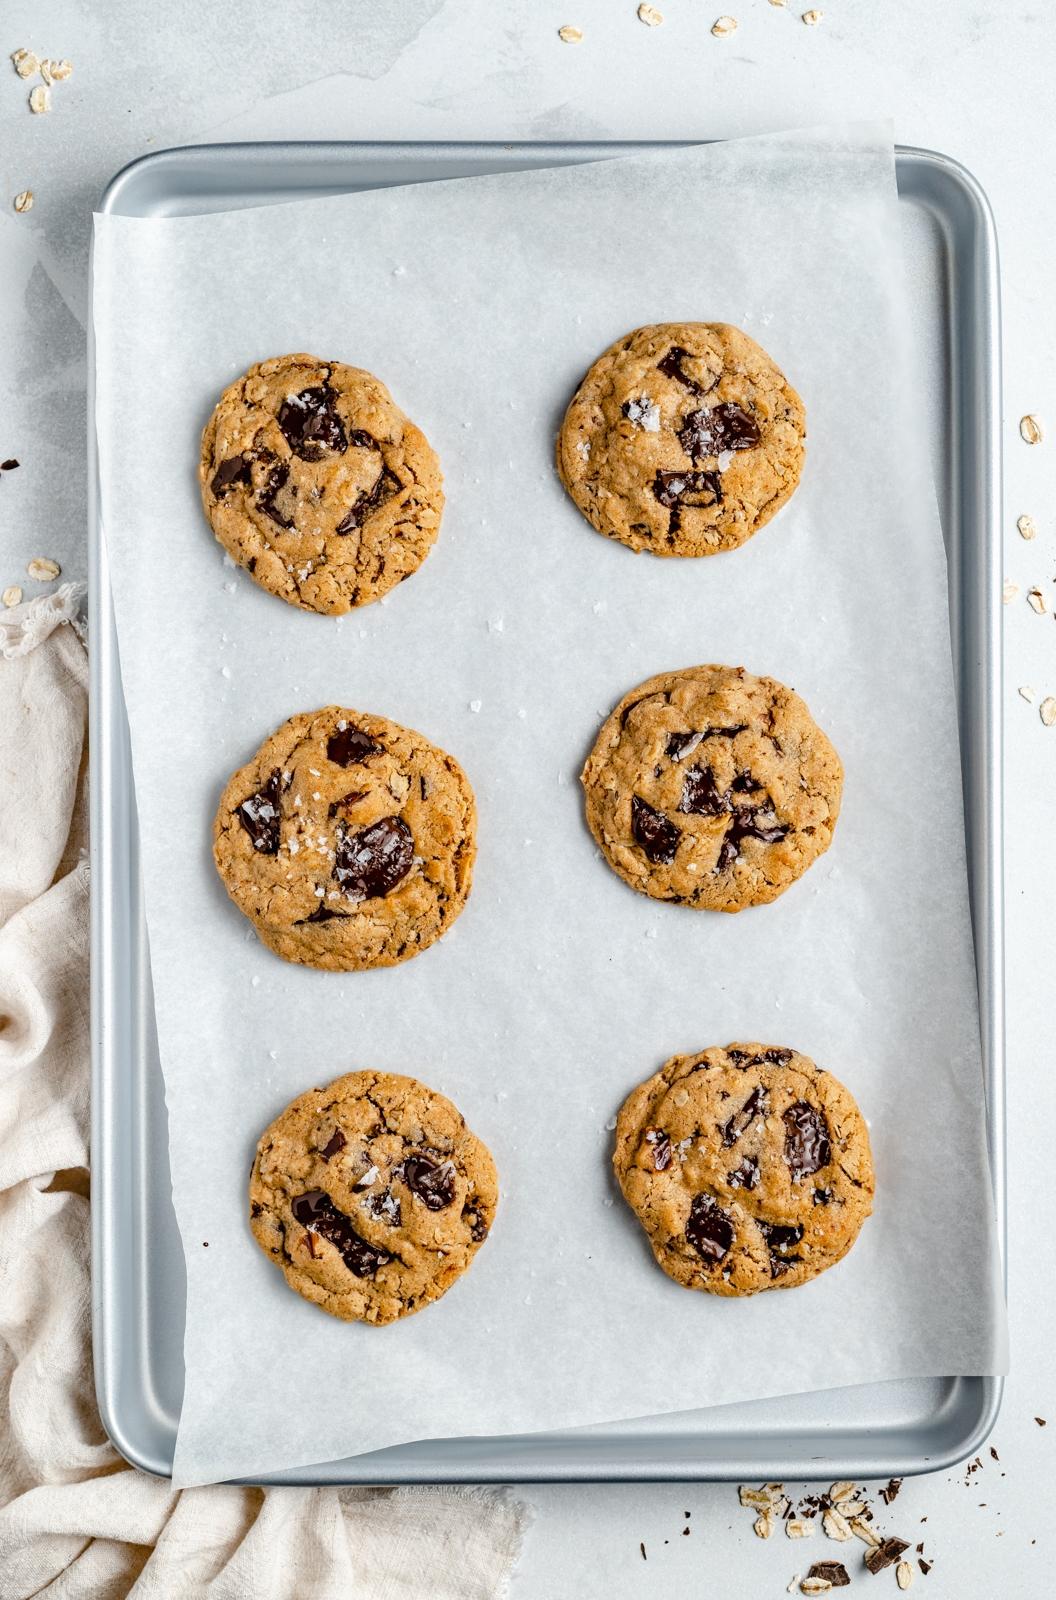 tahini oatmeal cookies on a baking sheet